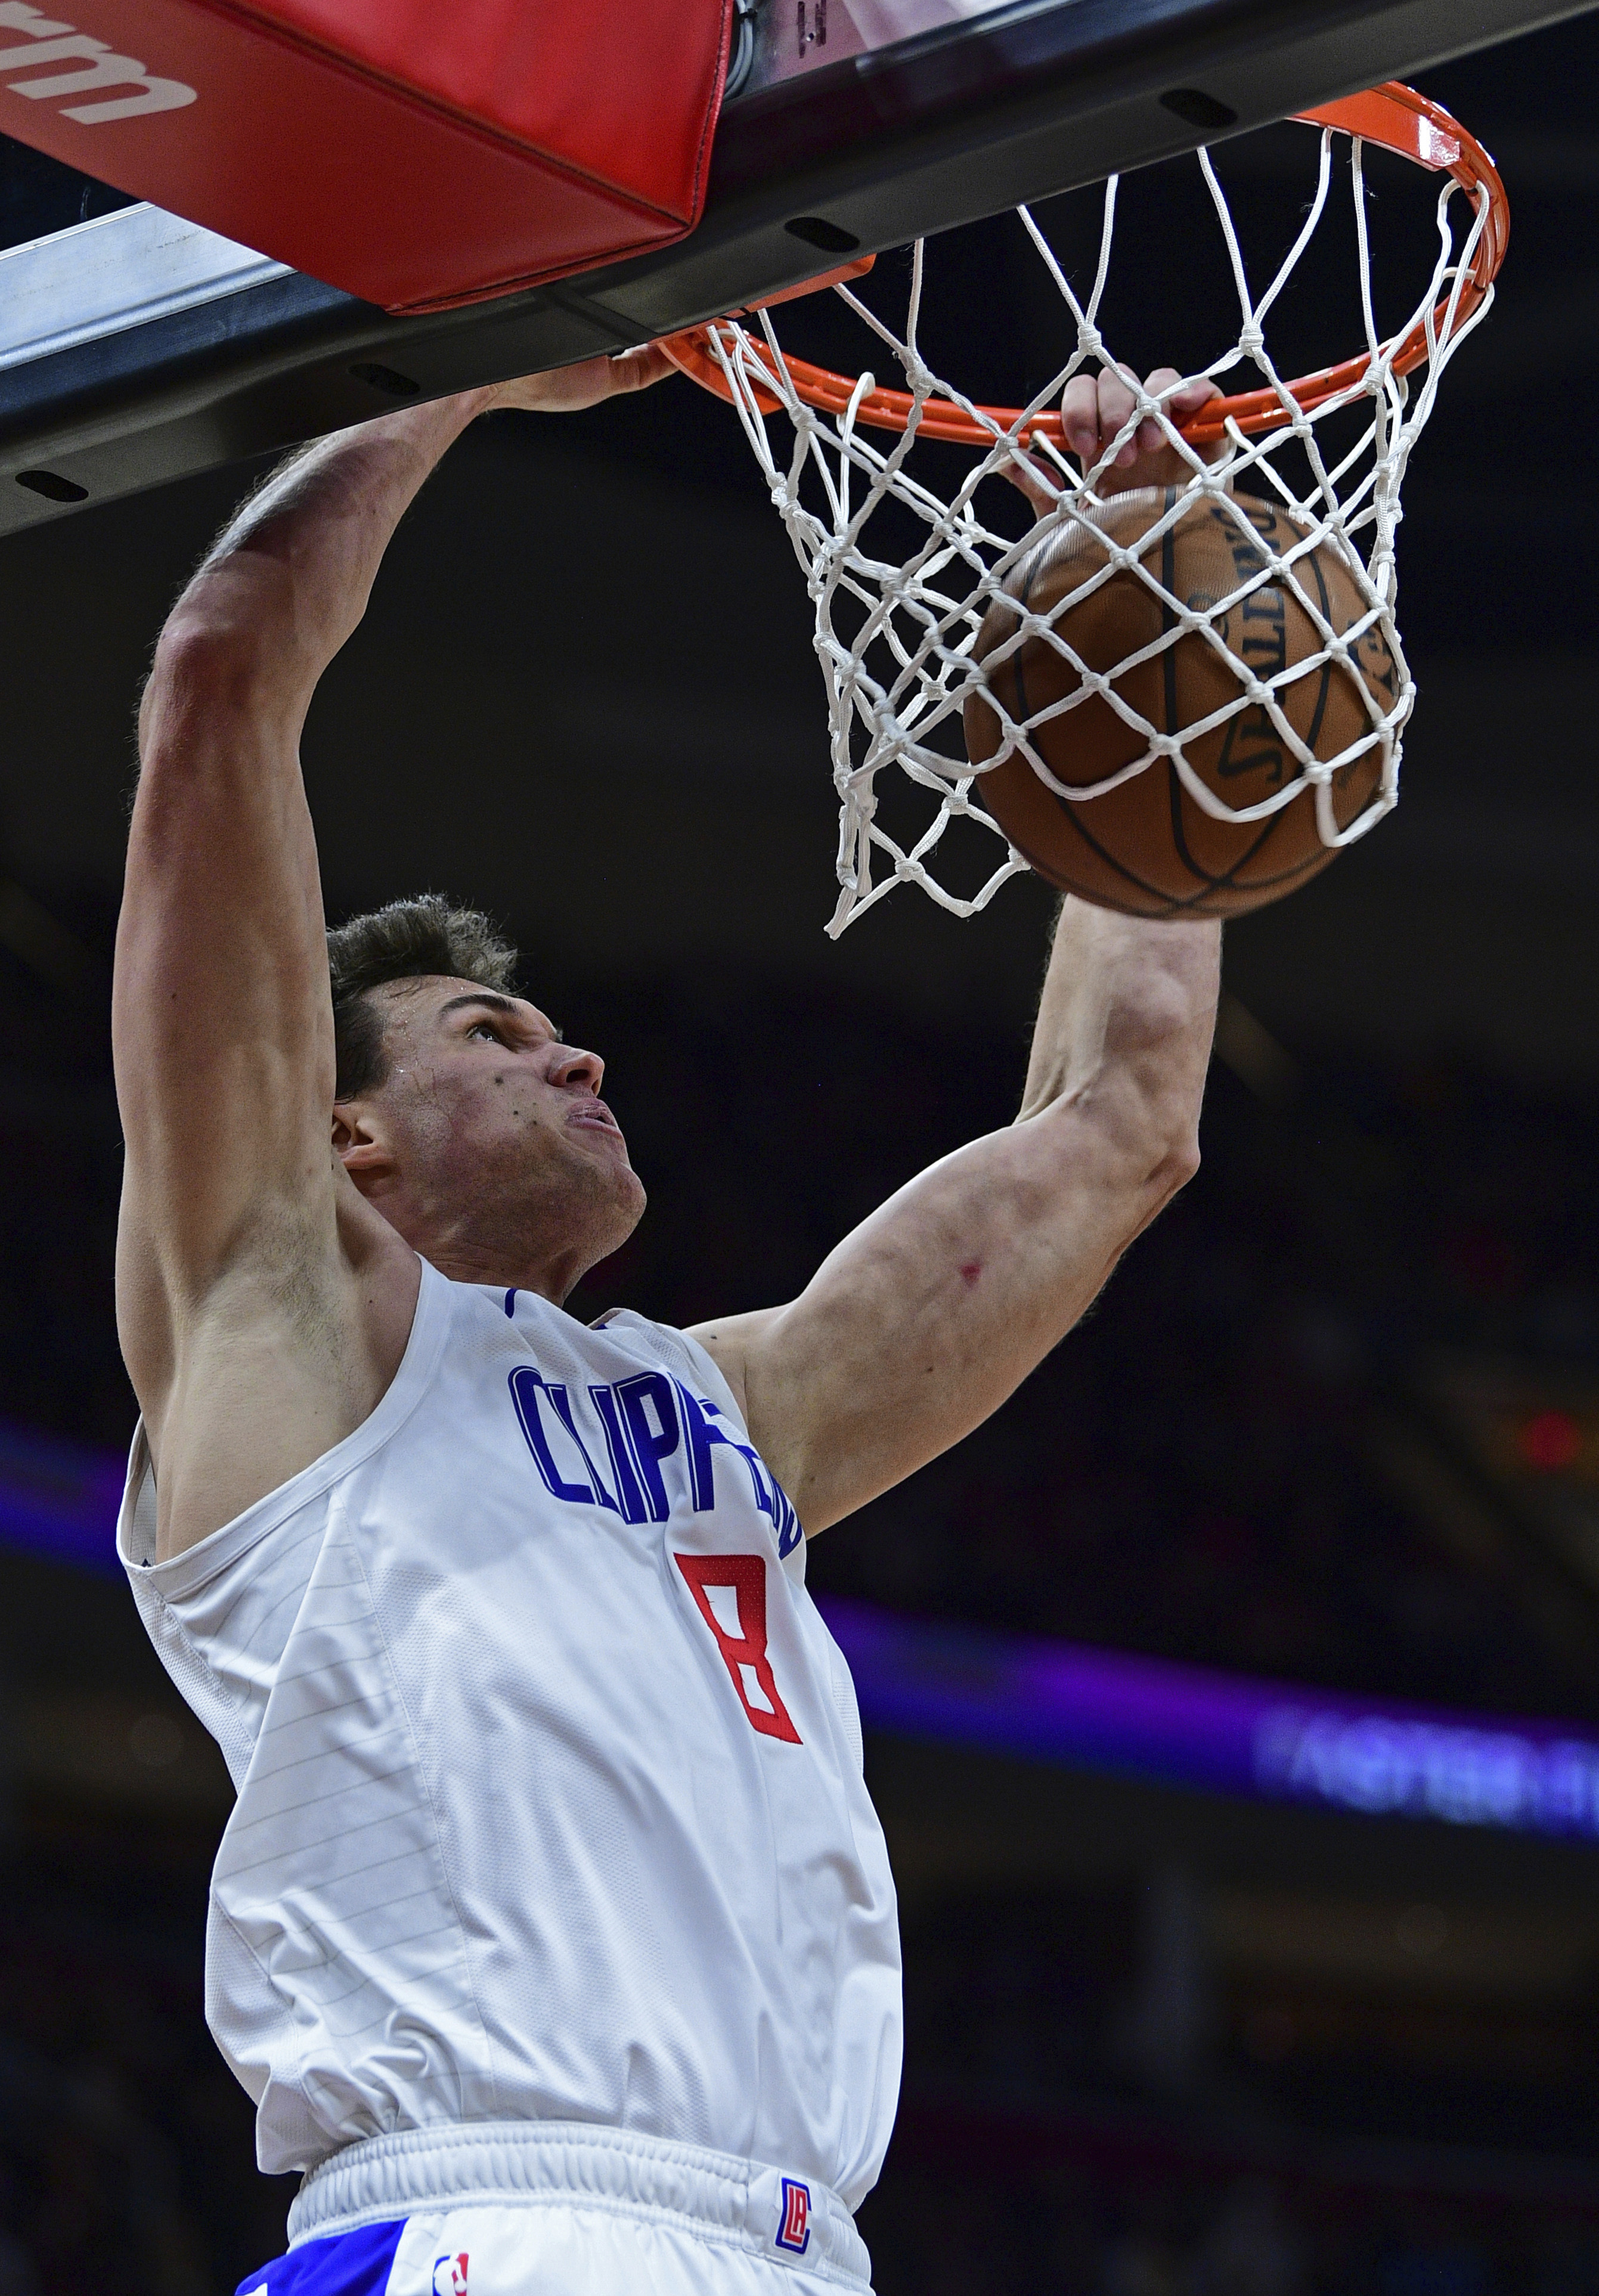 Gallinari scores 27 as Clippers edge Cavaliers 110-108